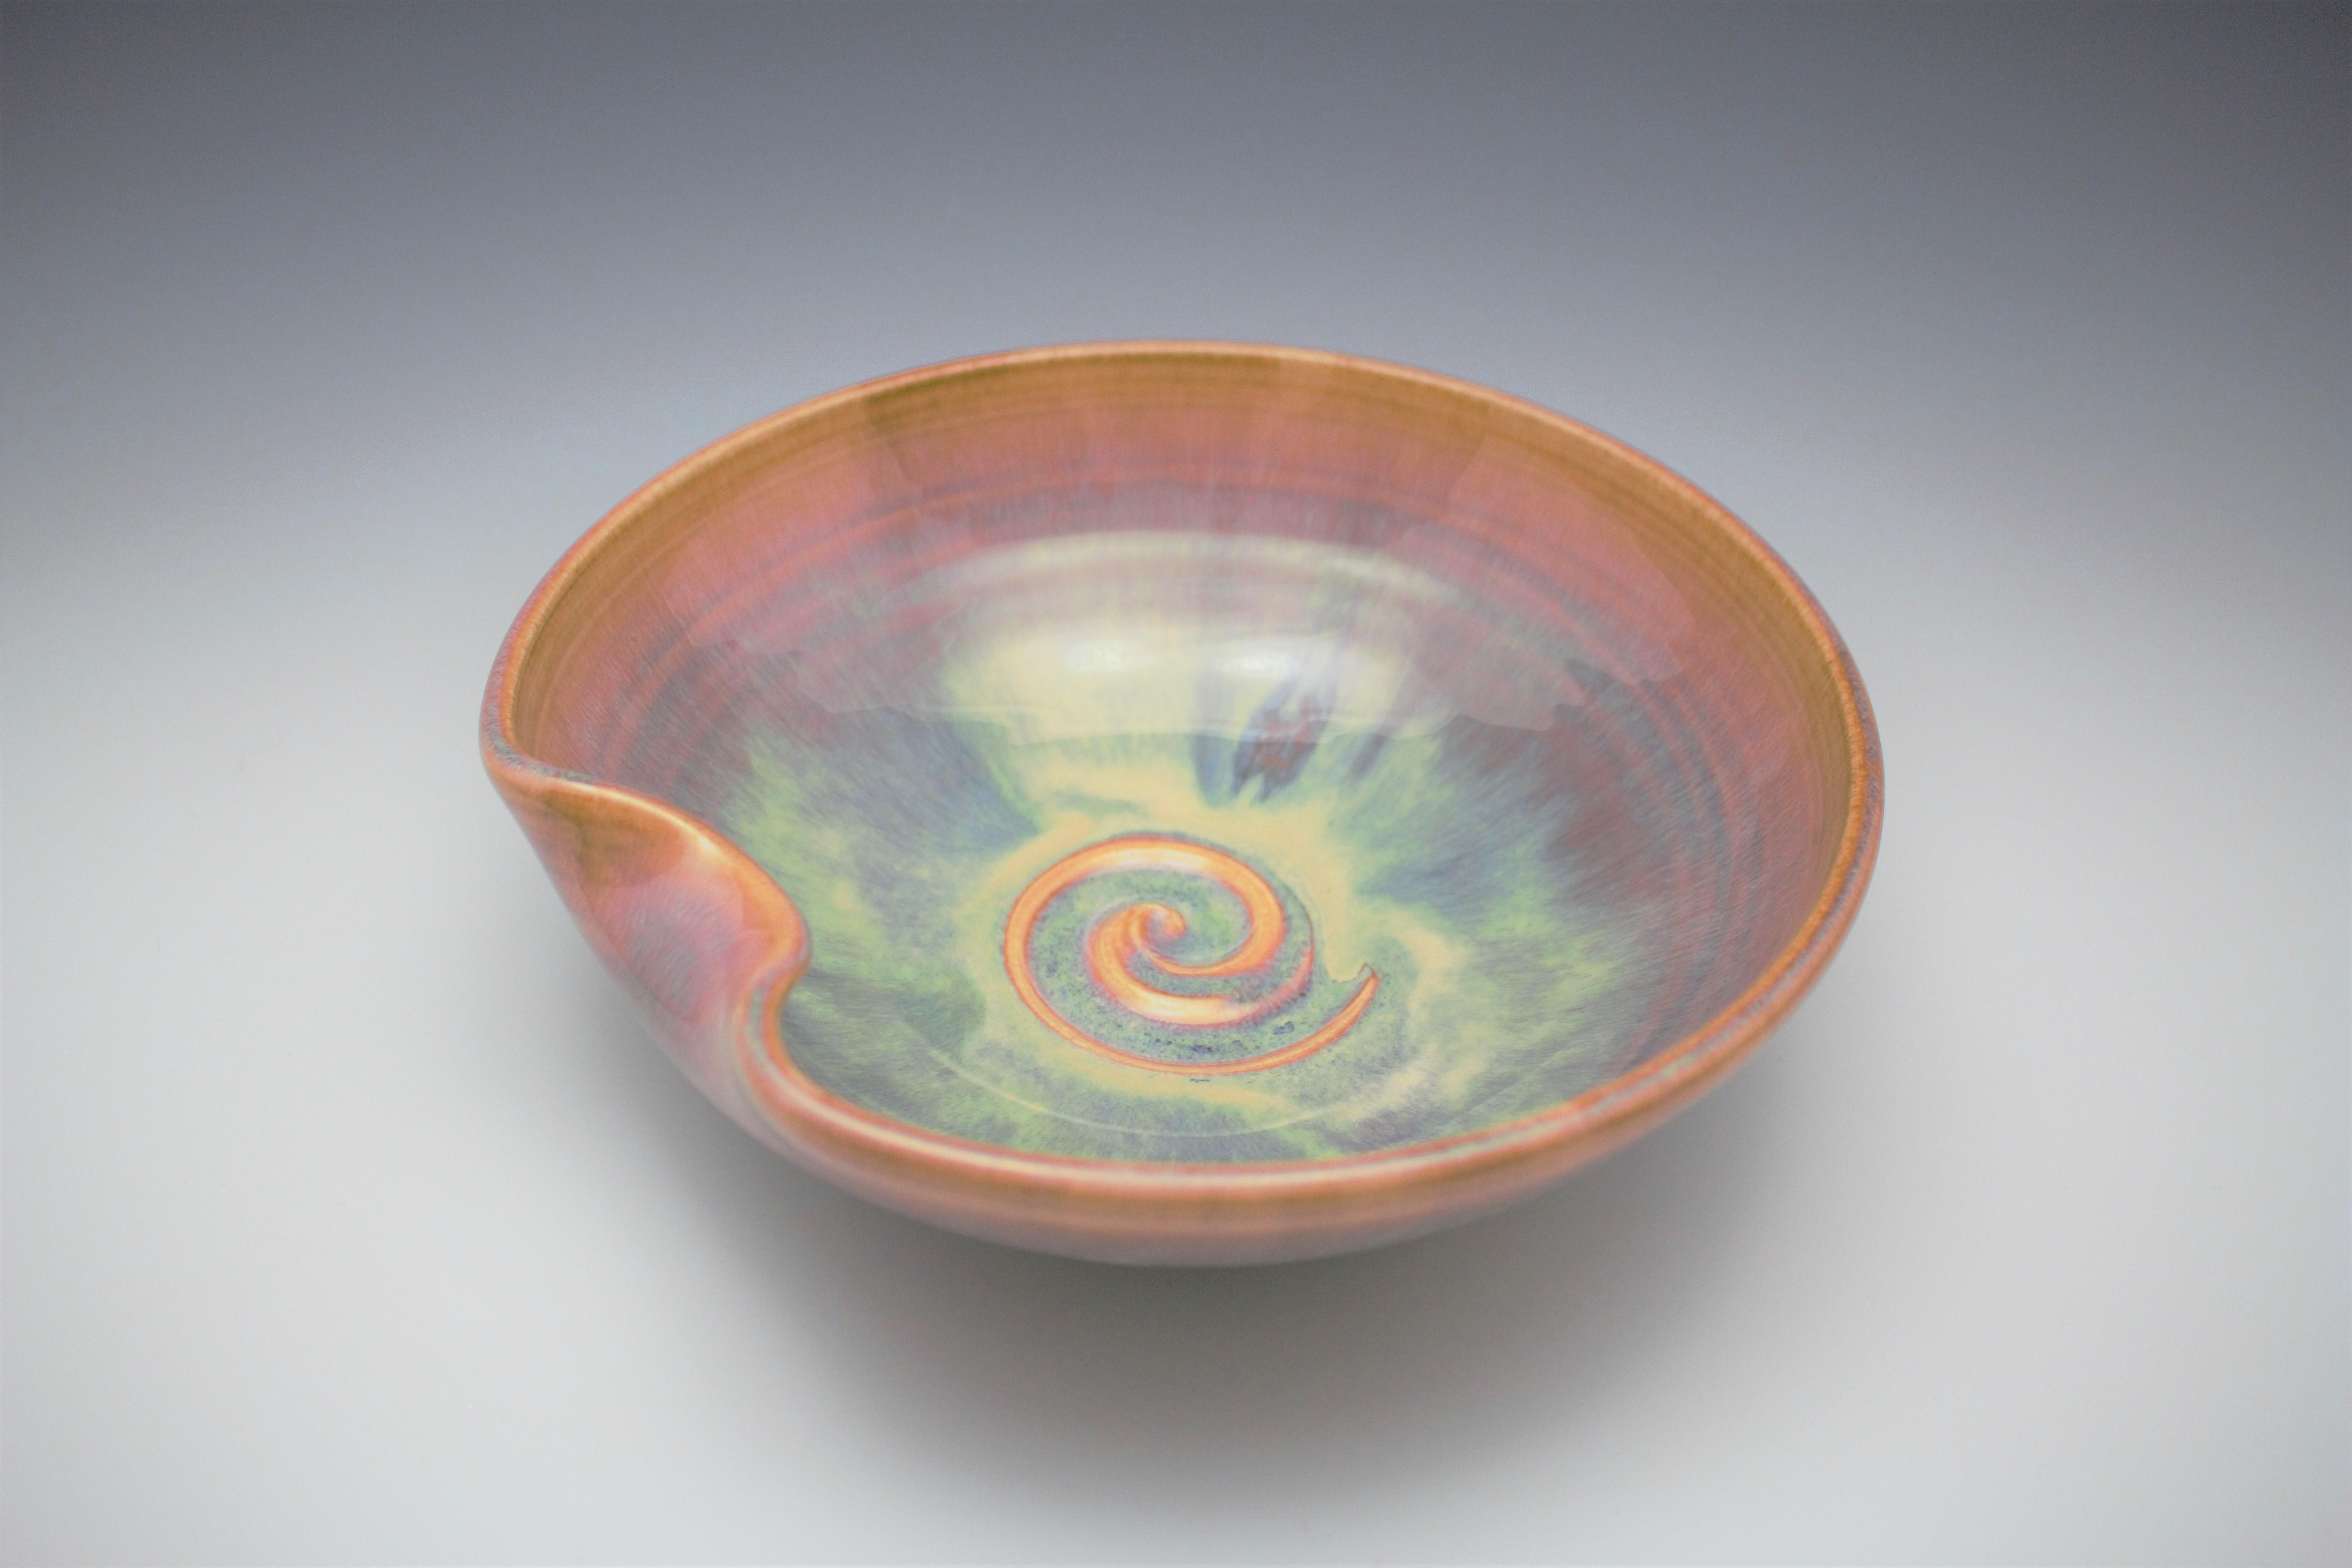 Thumb Bowl